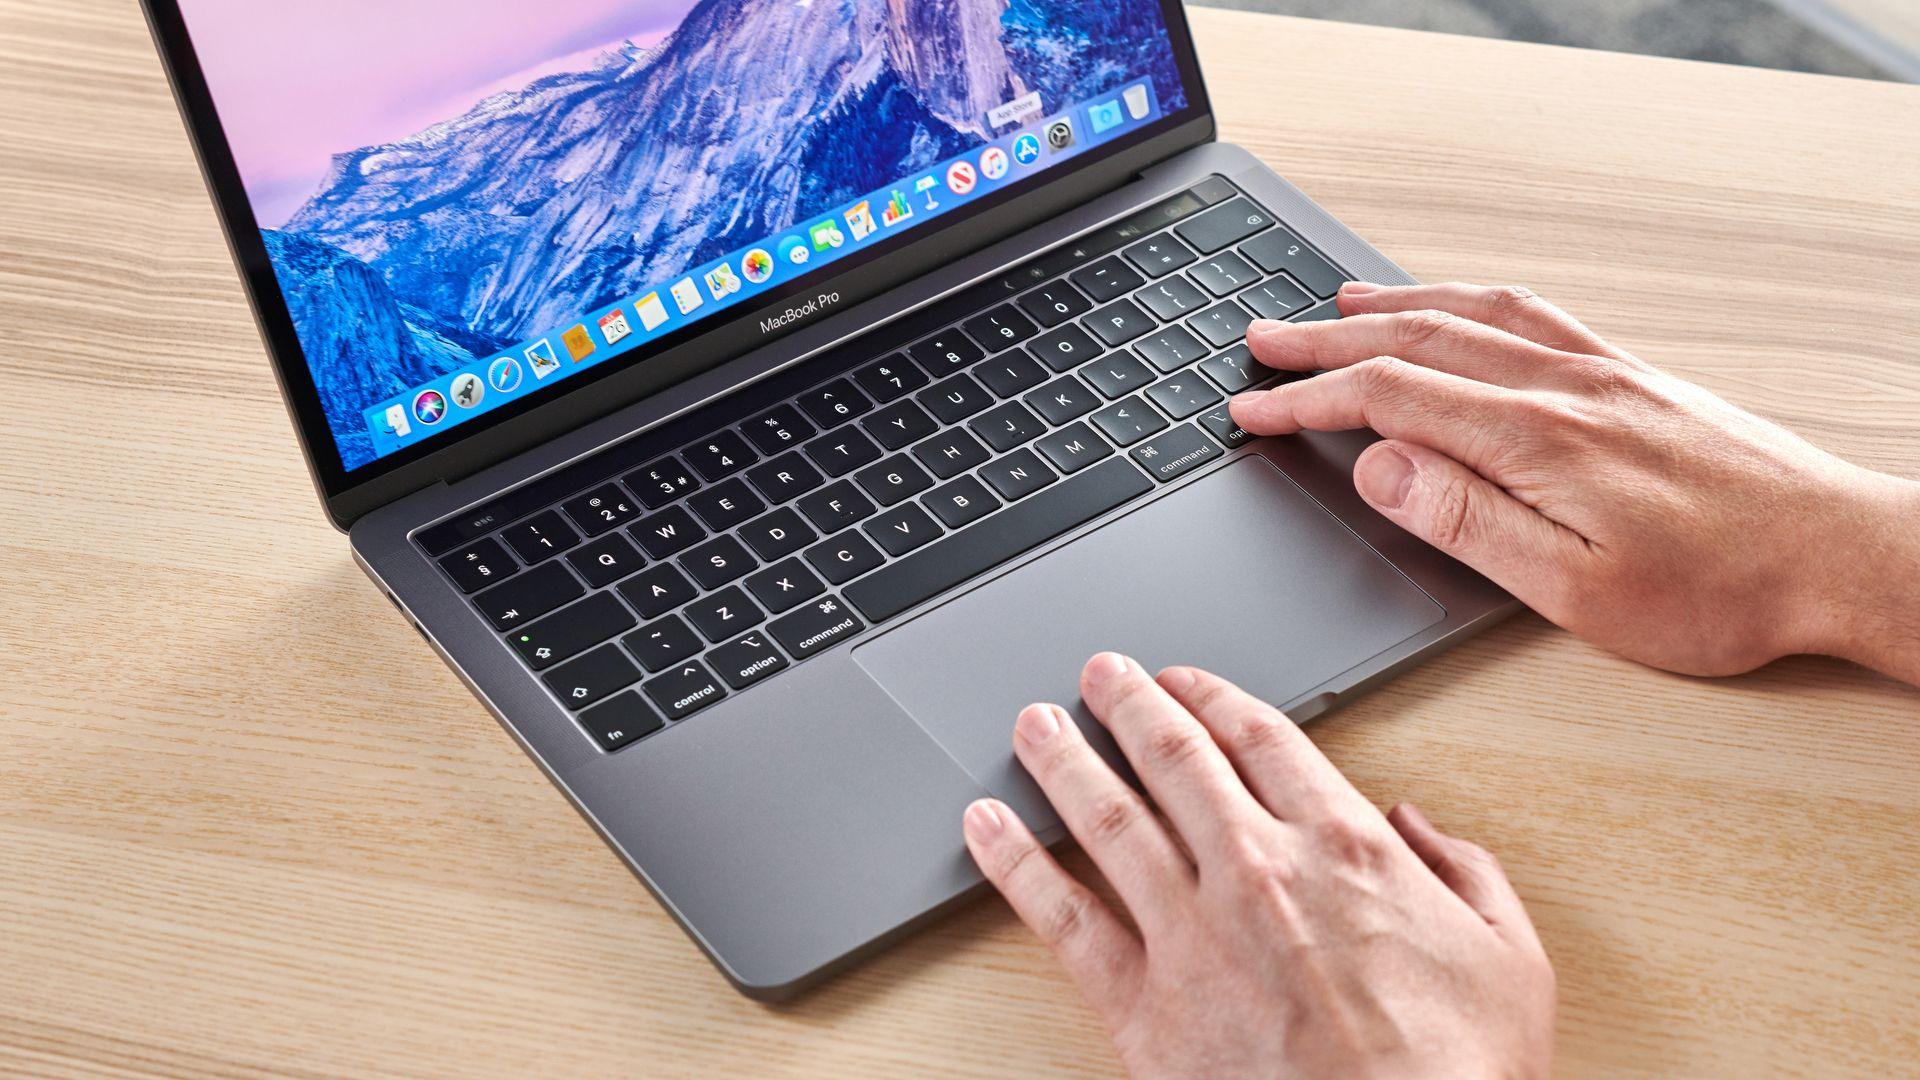 Has Apple Delayed Macbook Pro 16 Inch Until 2020 Due To Keyboard Issues Macbook Pro 13 Inch Newest Macbook Pro Macbook Pro Laptop